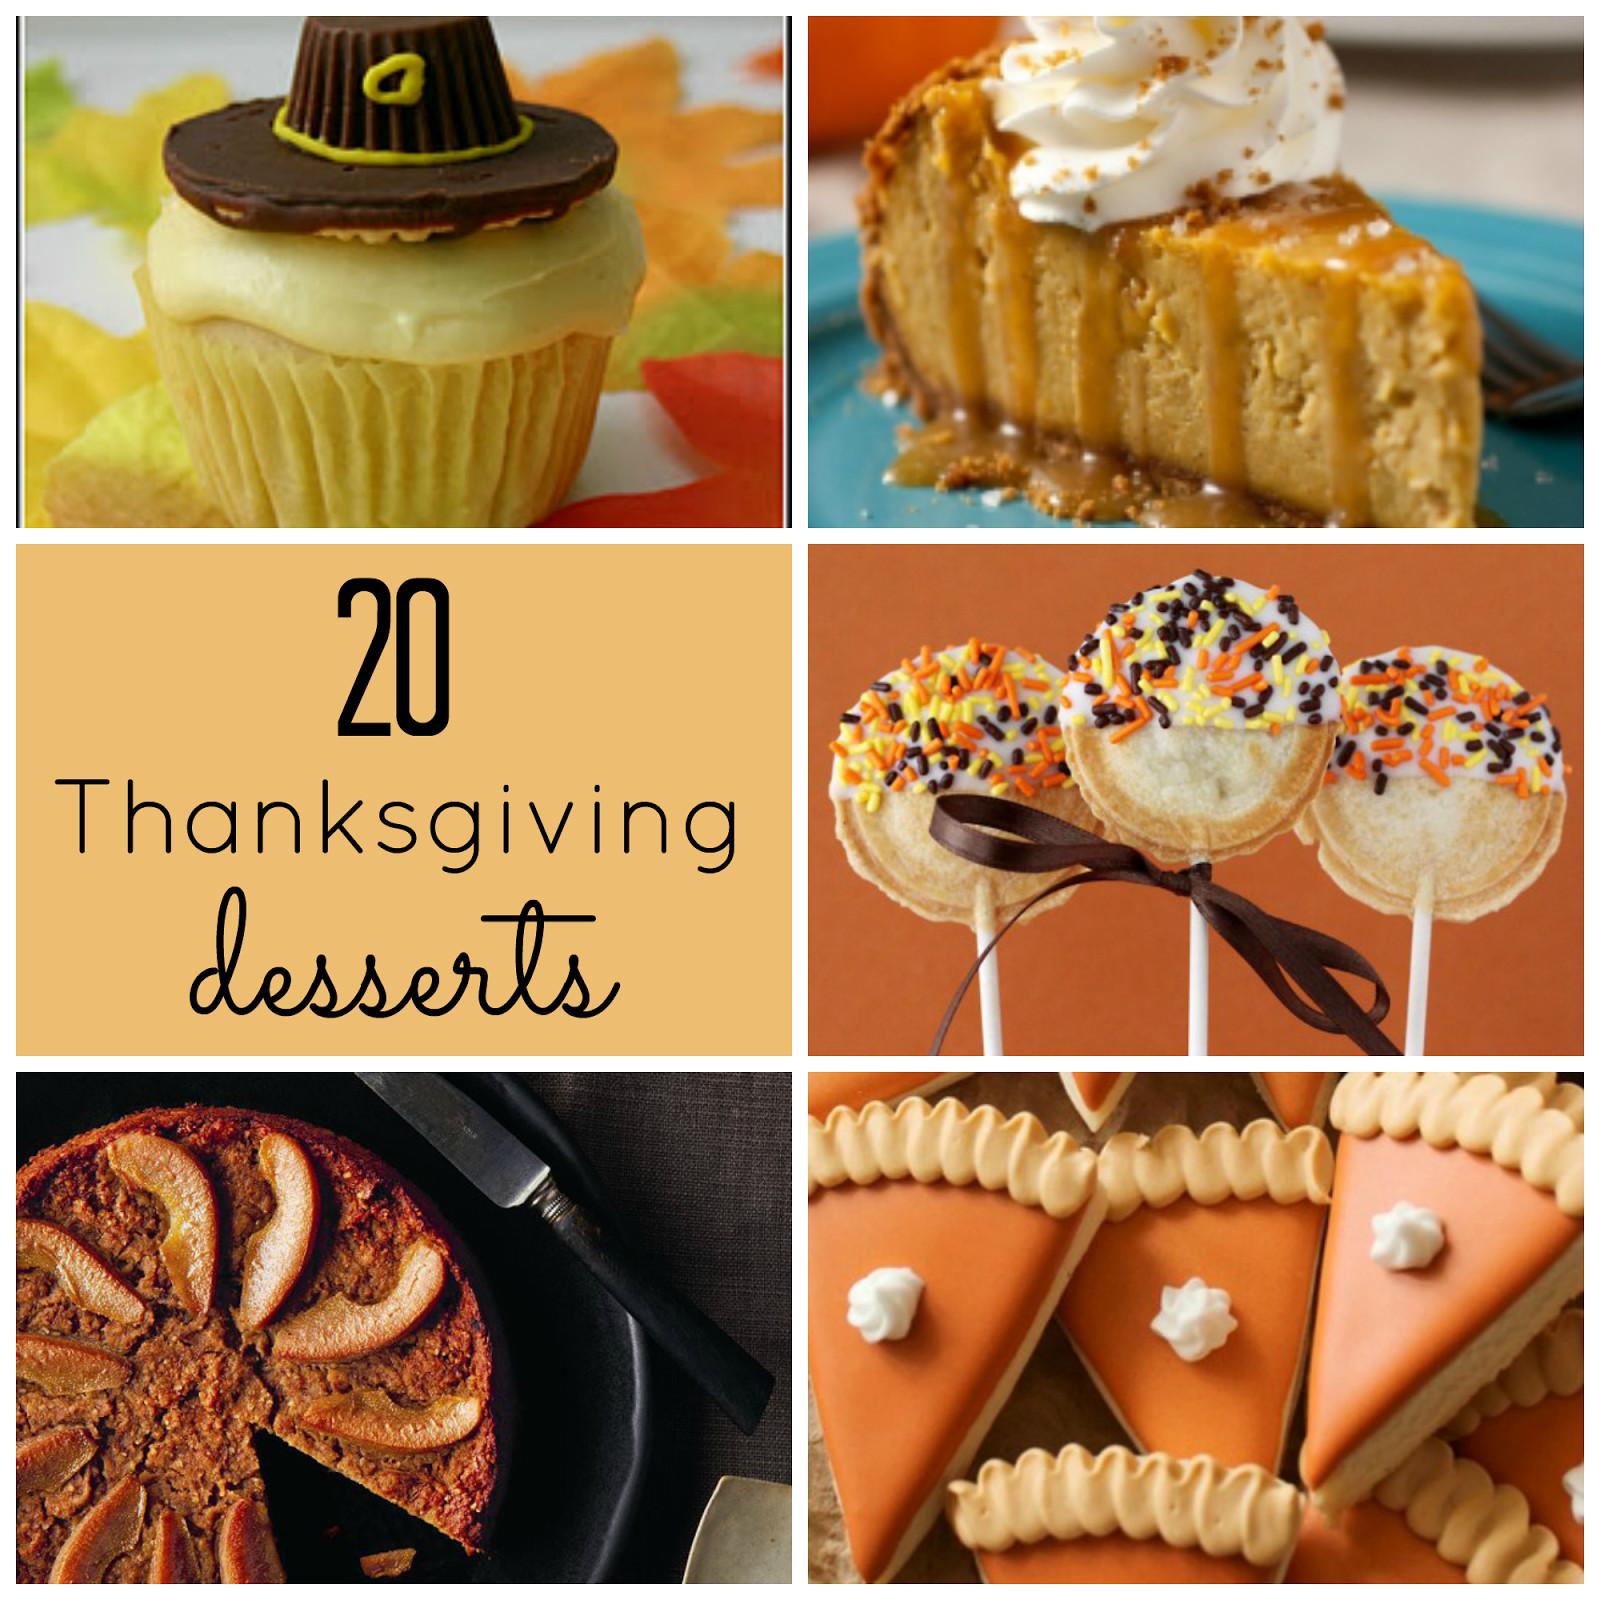 Thanksgiving Dessert Ideas  The Upstairs Crafter Good Ideas Thanksgiving Desserts